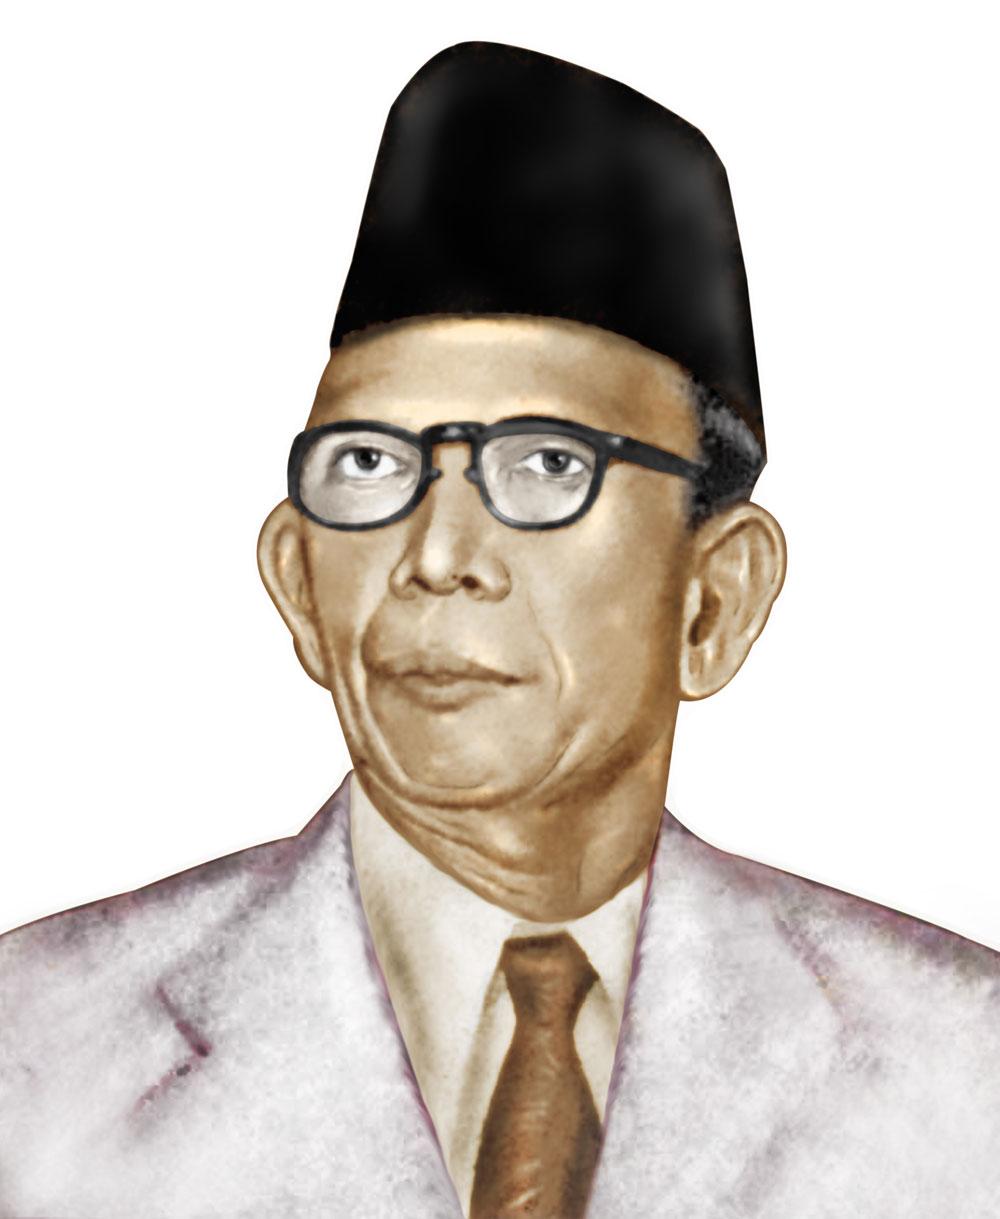 Biografi Singkat Ki Hajar Dewantara